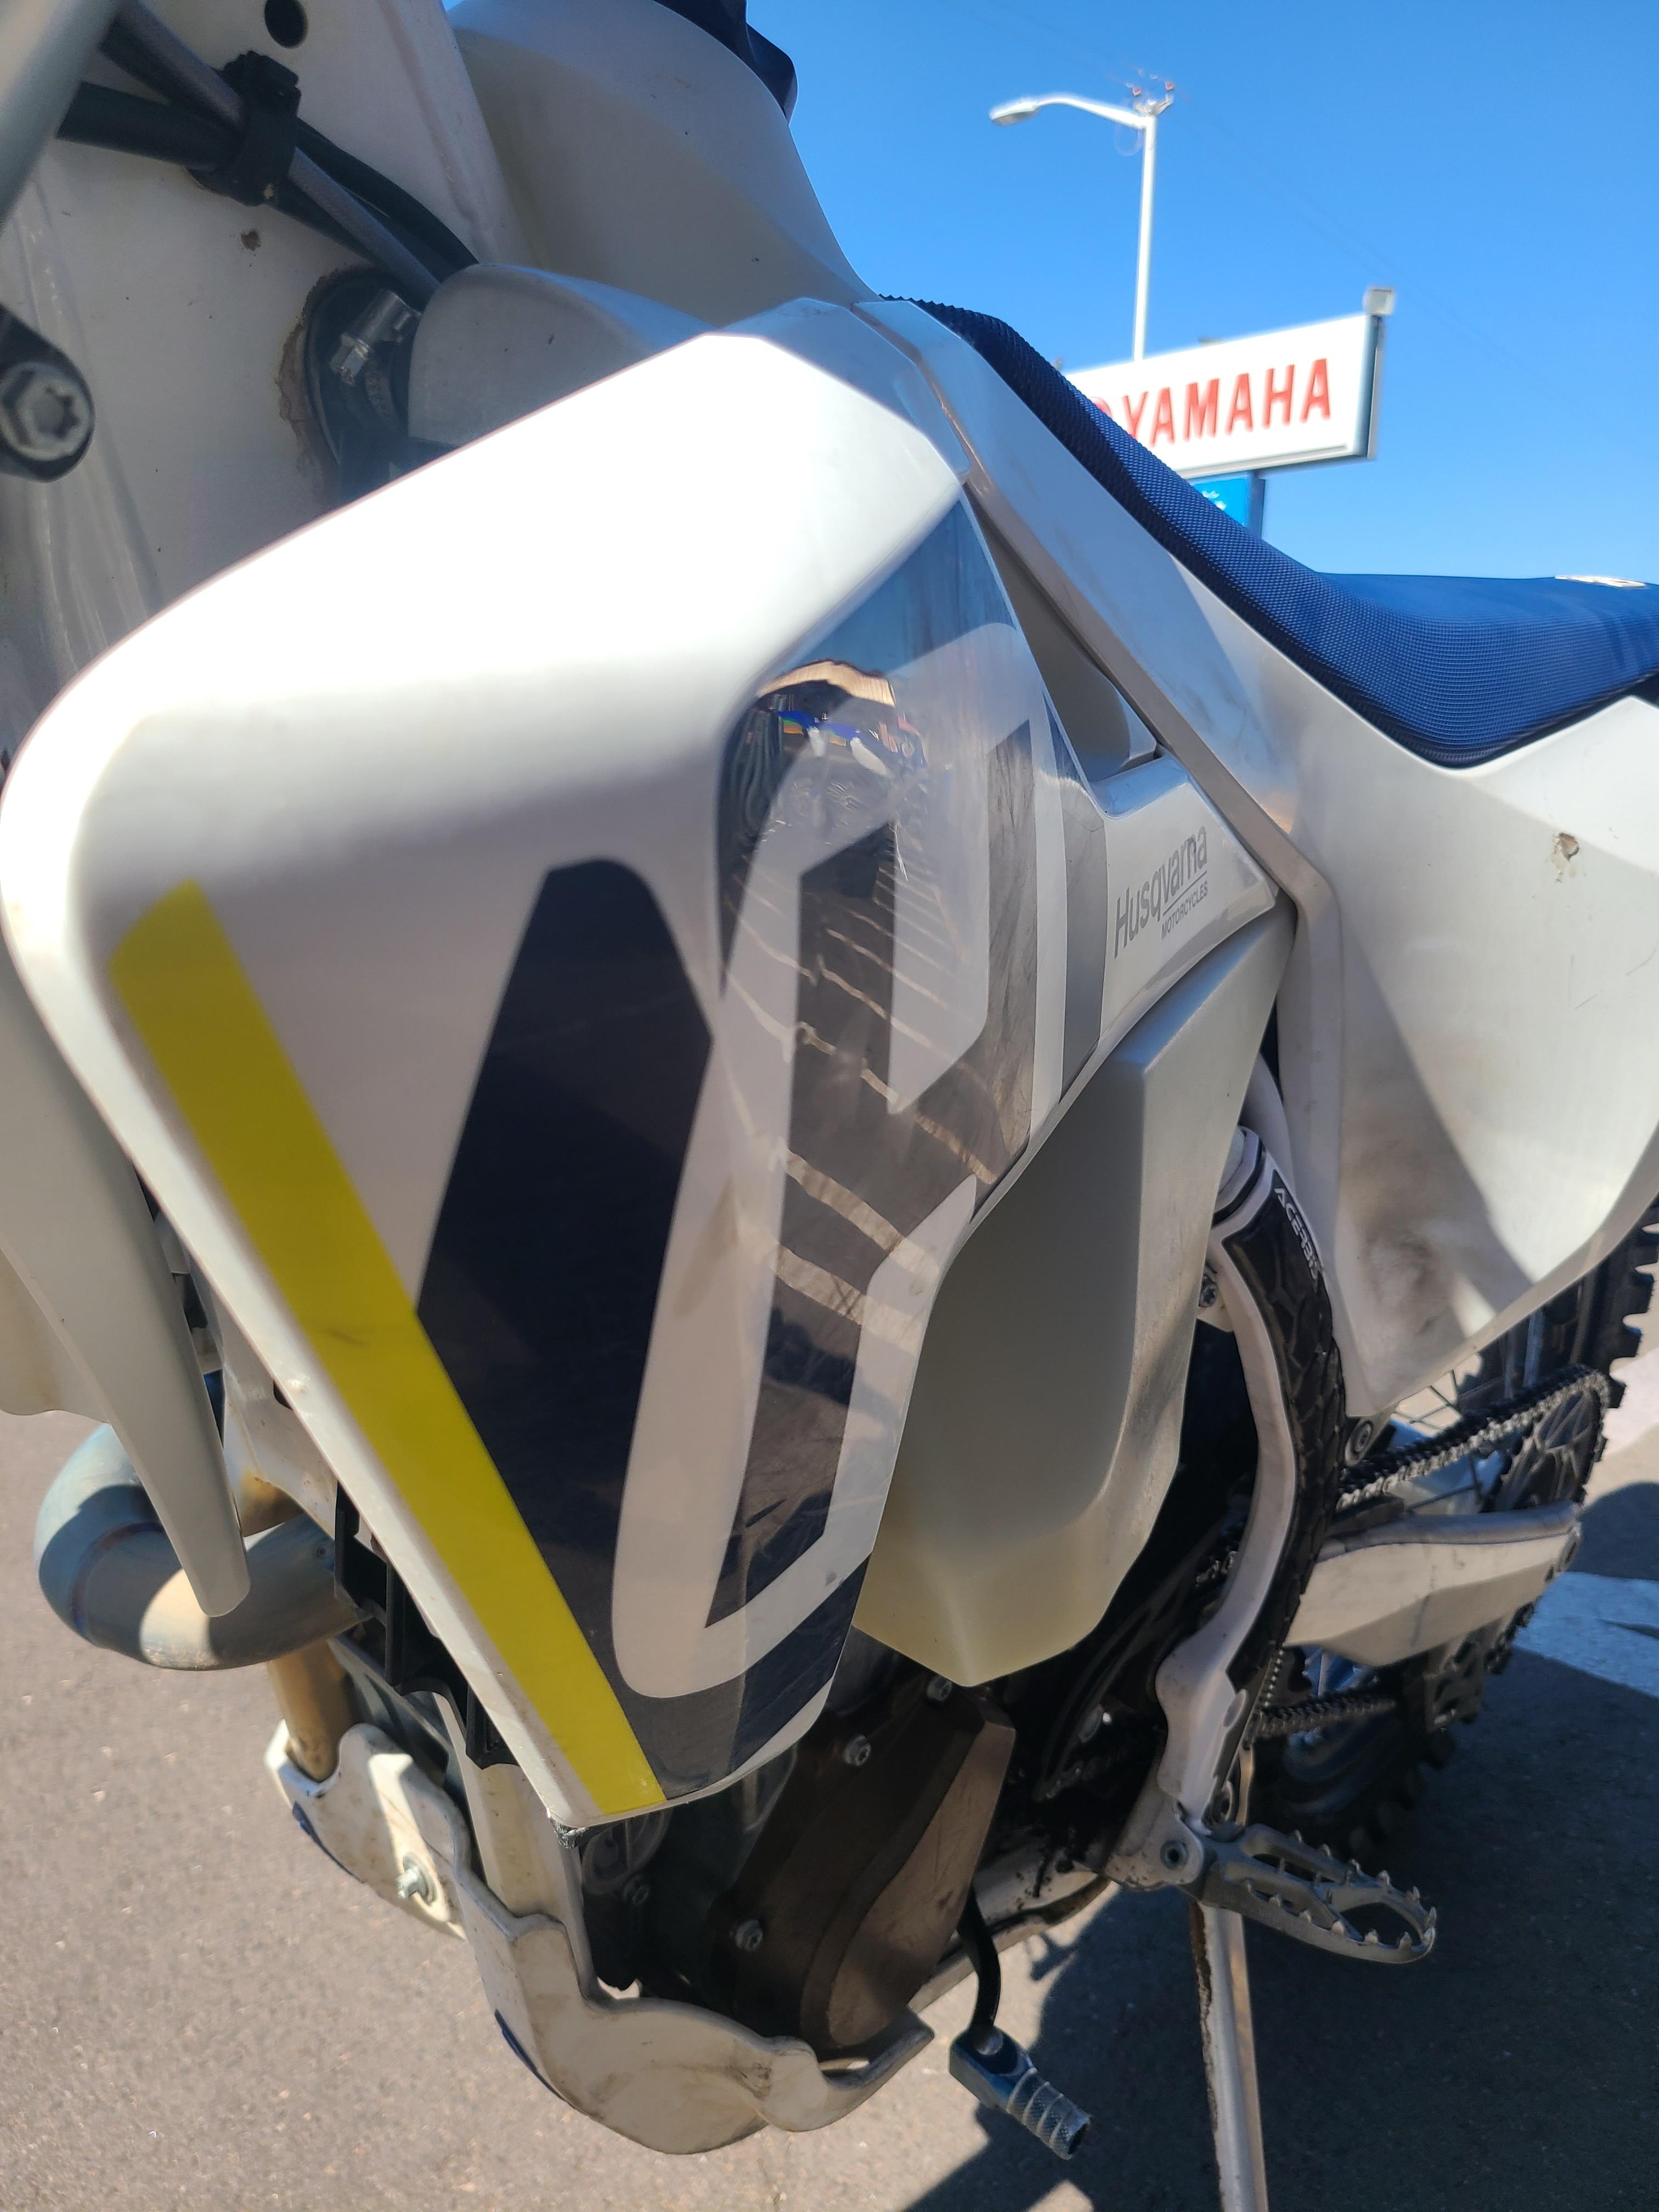 2018 Husqvarna FX 450 at Bobby J's Yamaha, Albuquerque, NM 87110